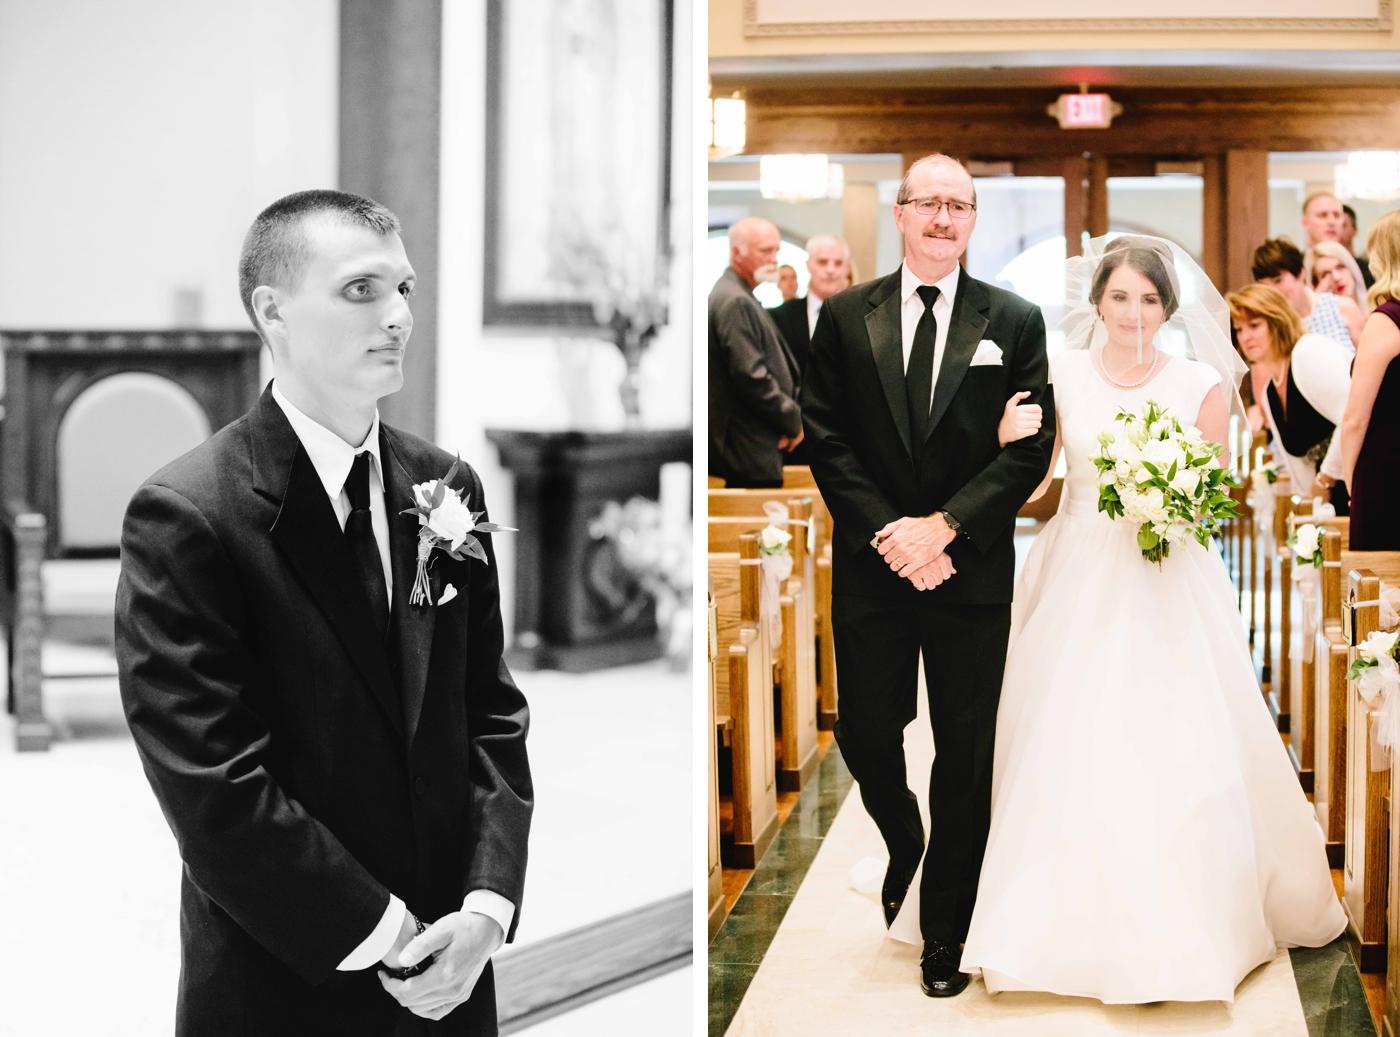 chicago-fine-art-wedding-photography-mccarthy45